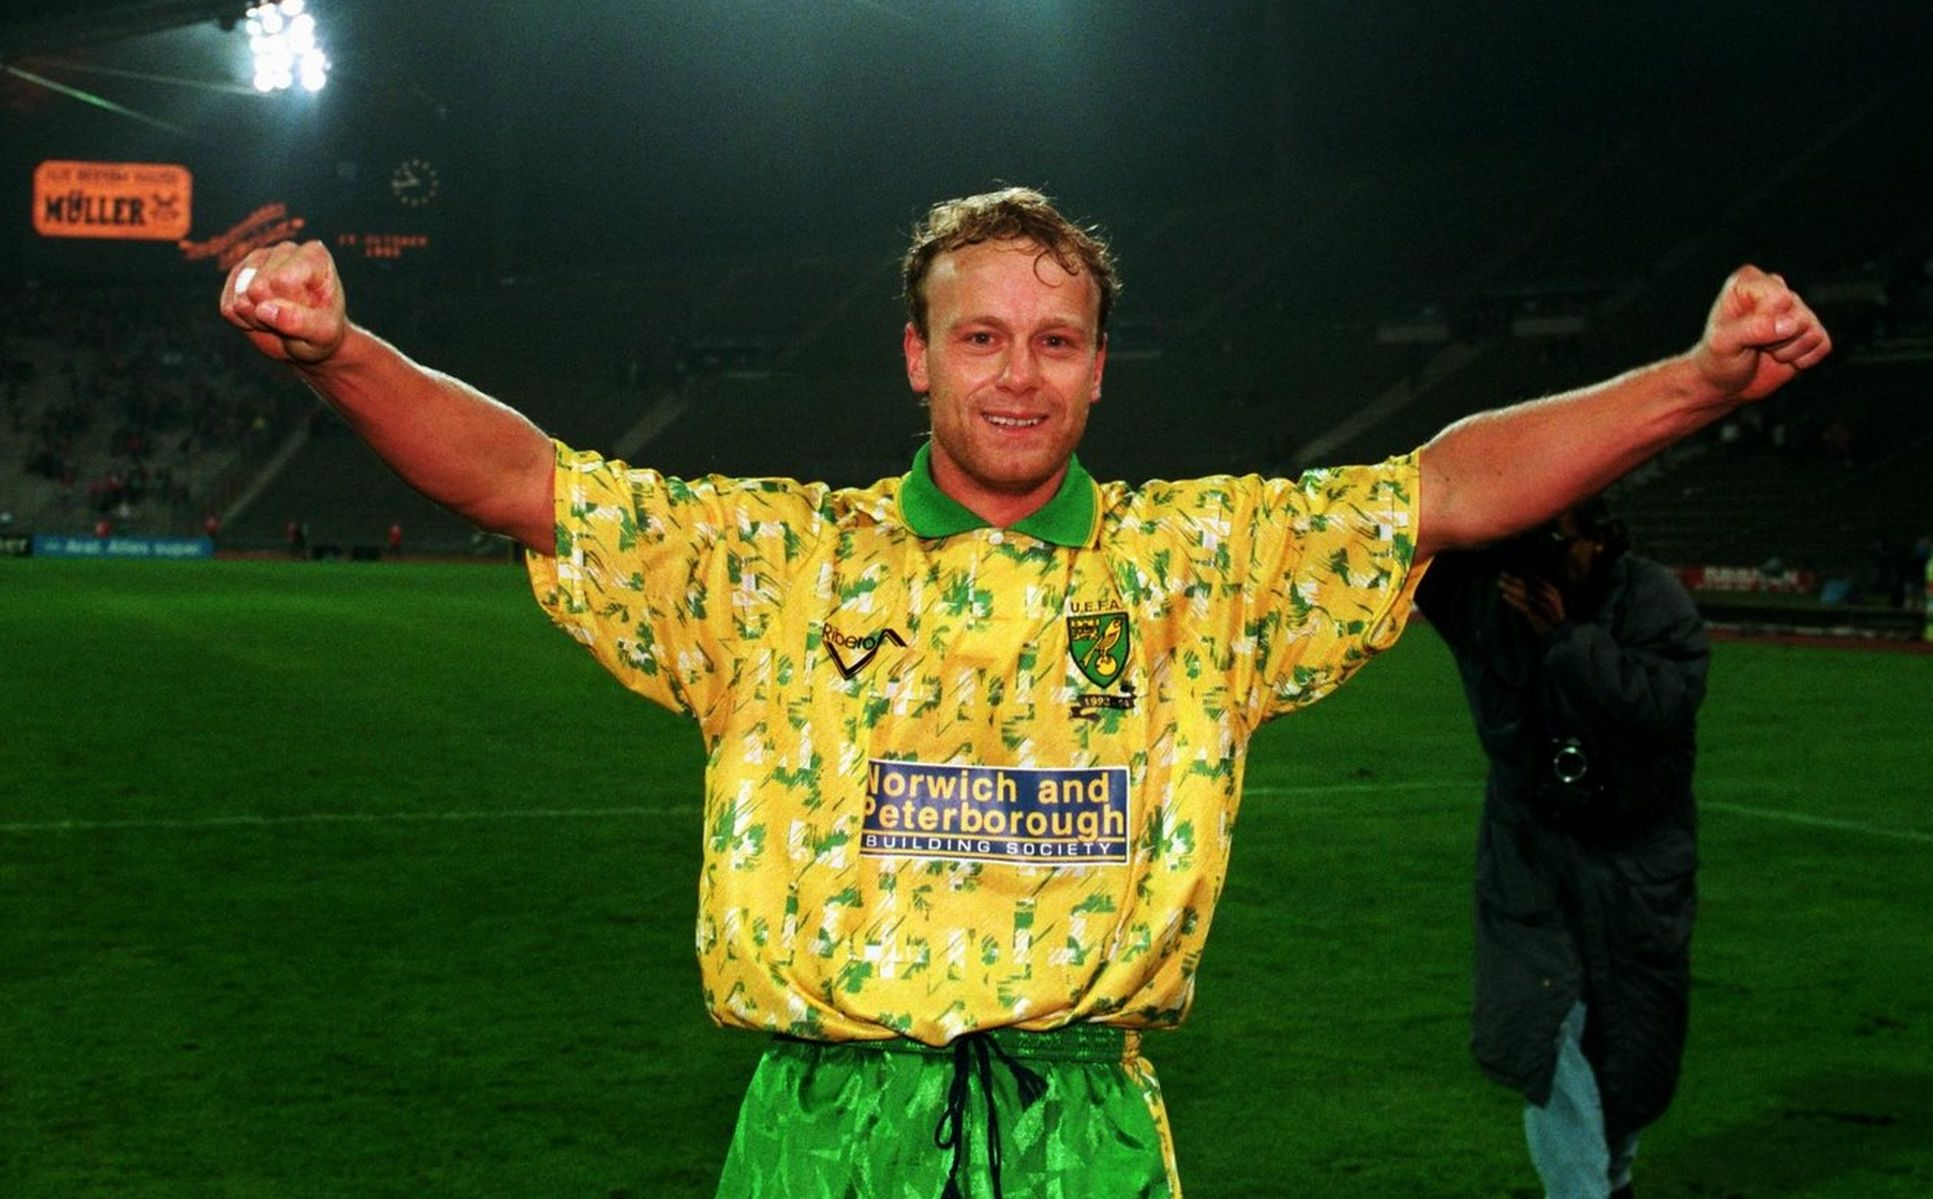 e99171e31e5 24 Norwich City 1992-93 - worst soccer uniforms all time - worst football  kits